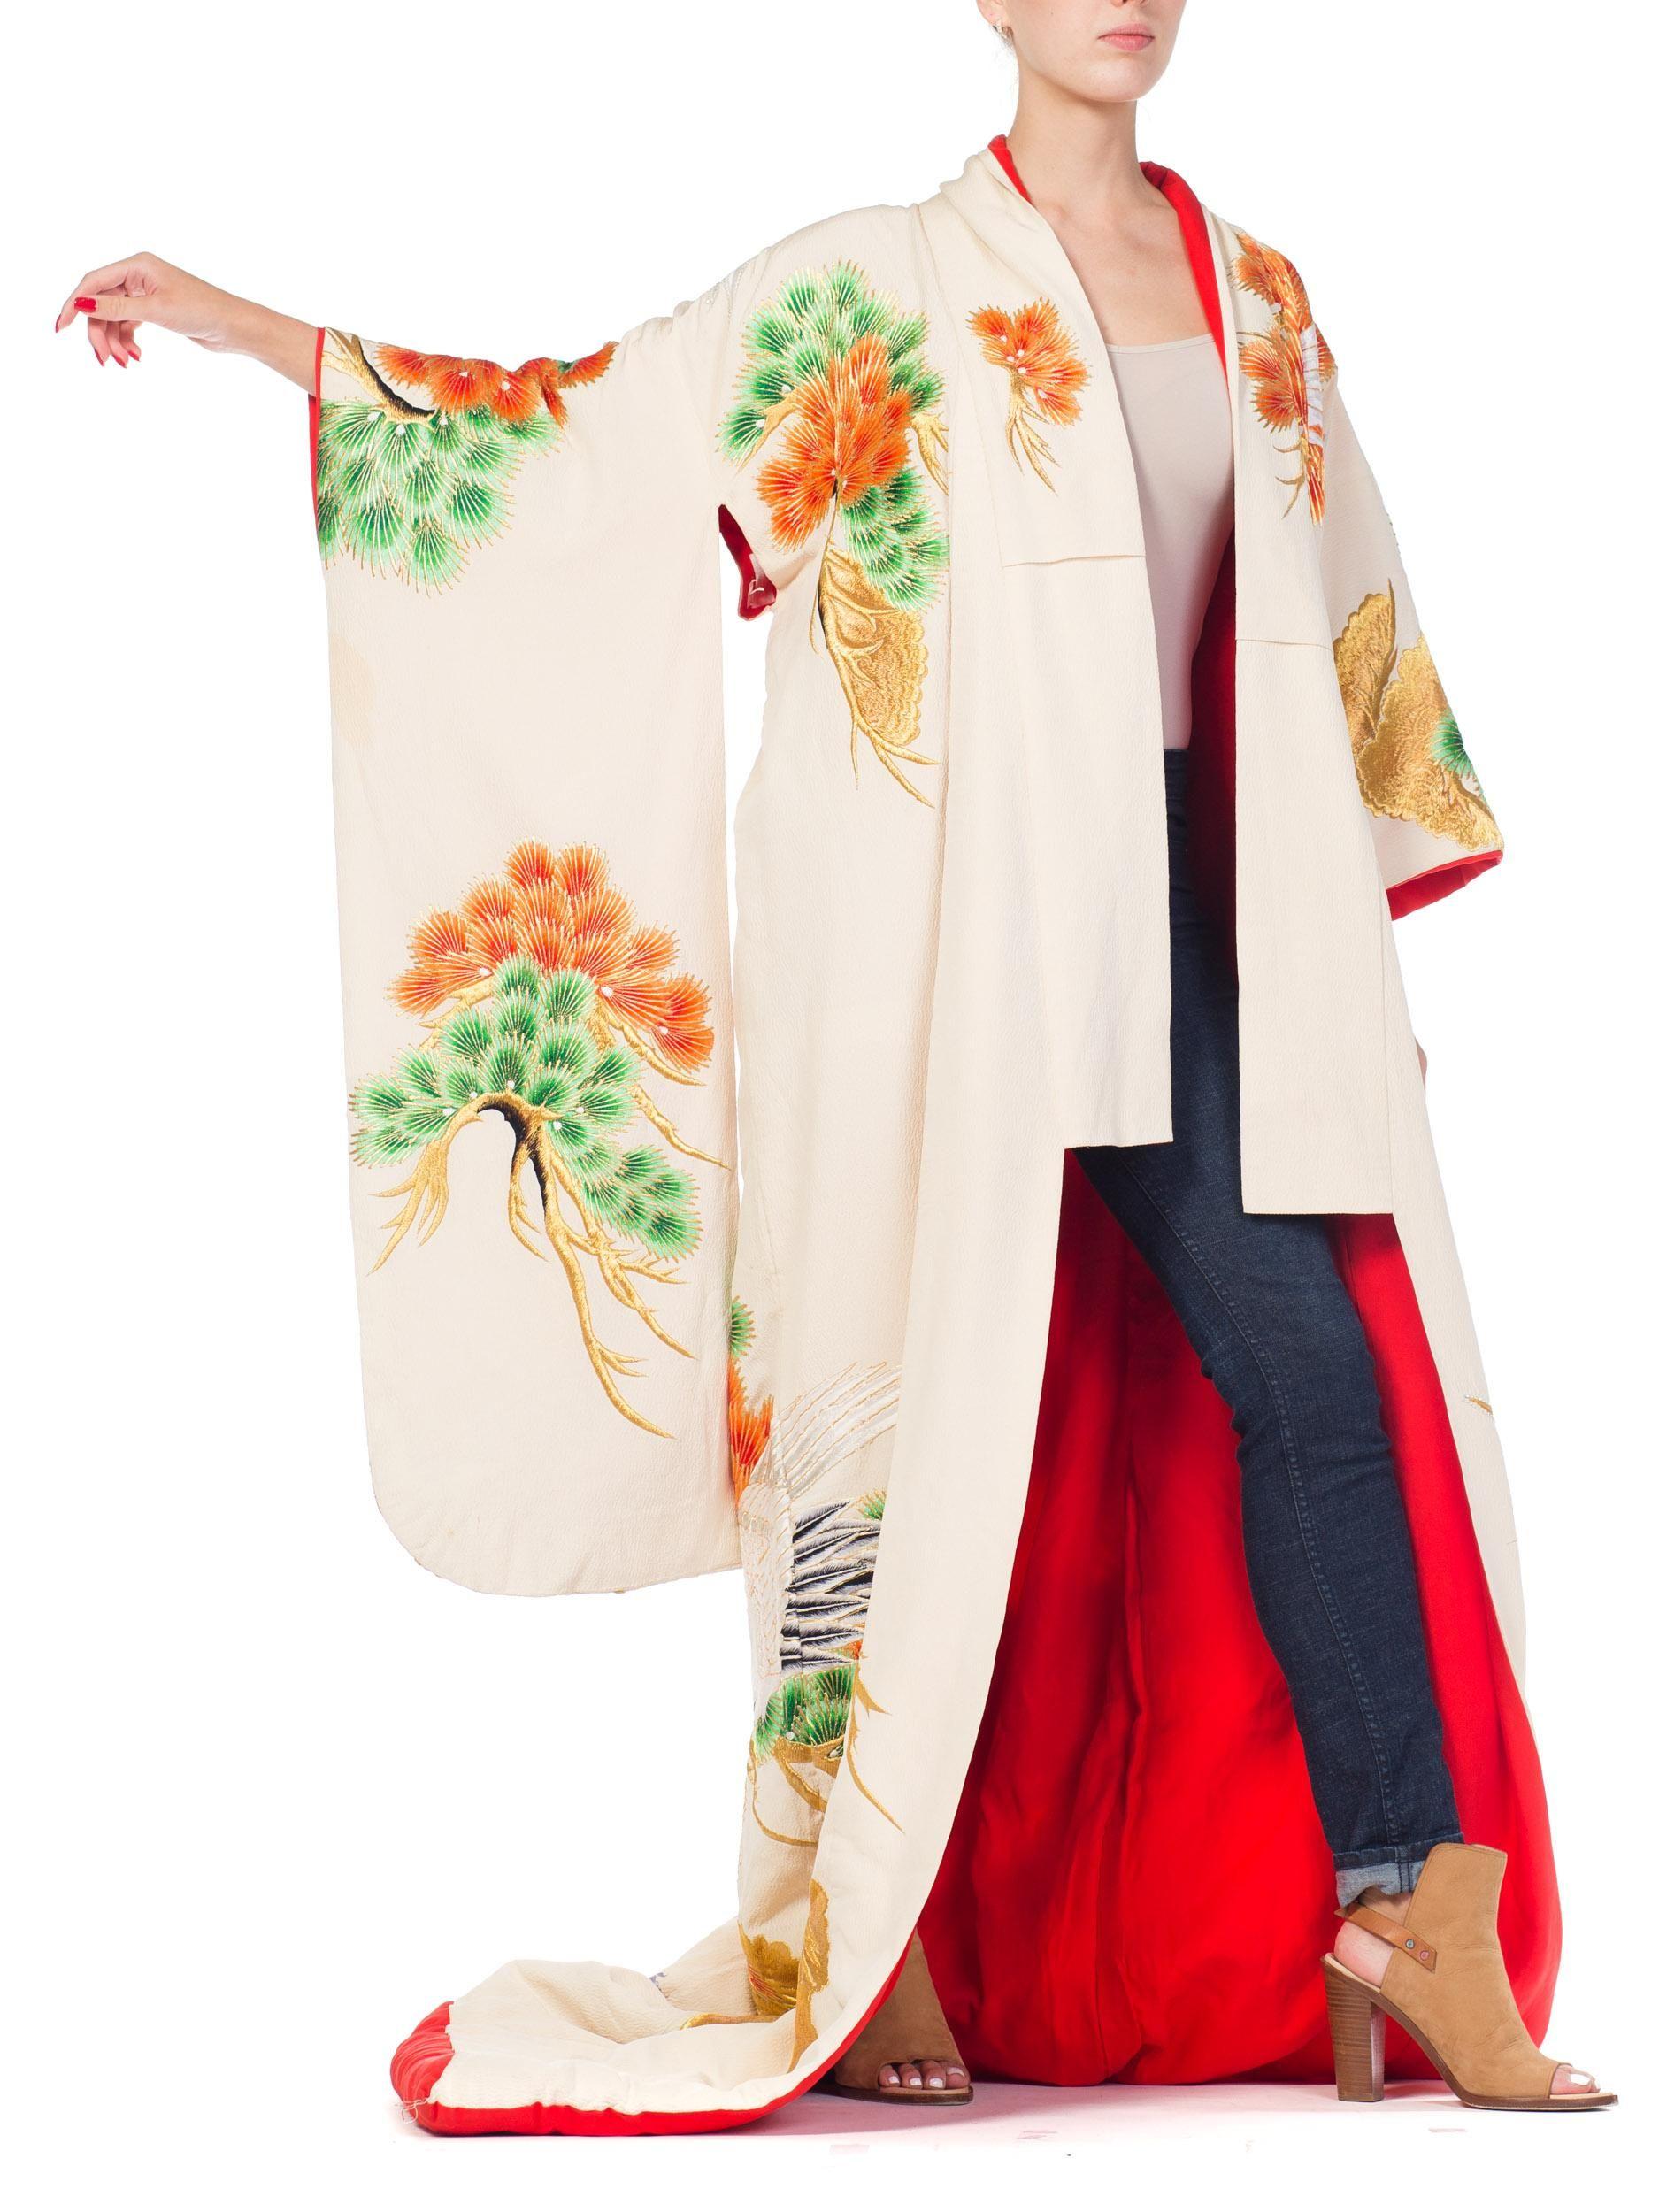 Japanese Wedding Kimono 1930 In 2020 Japanese Wedding Kimono Wedding Kimono Japanese Wedding